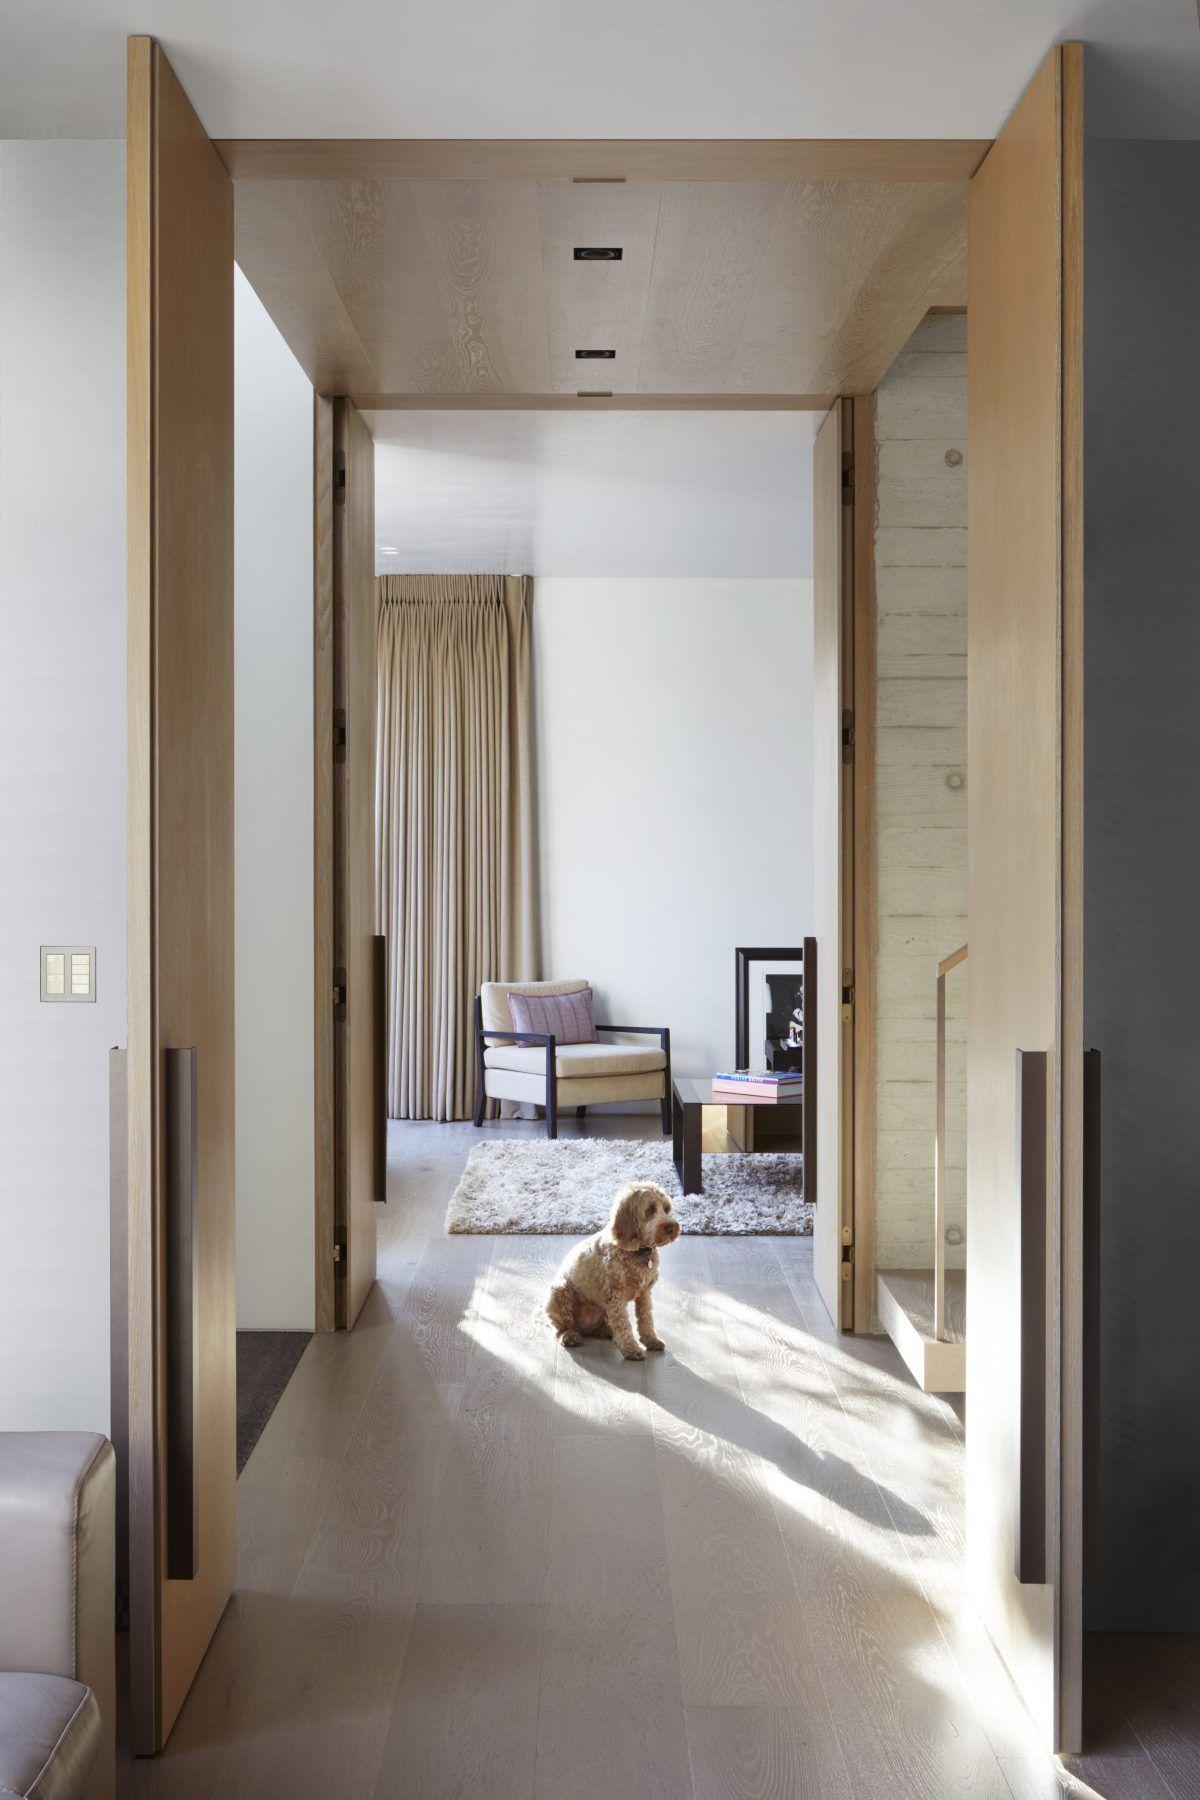 Kenwood Lee House has been shortlisted for Haringey Design Awards 2018